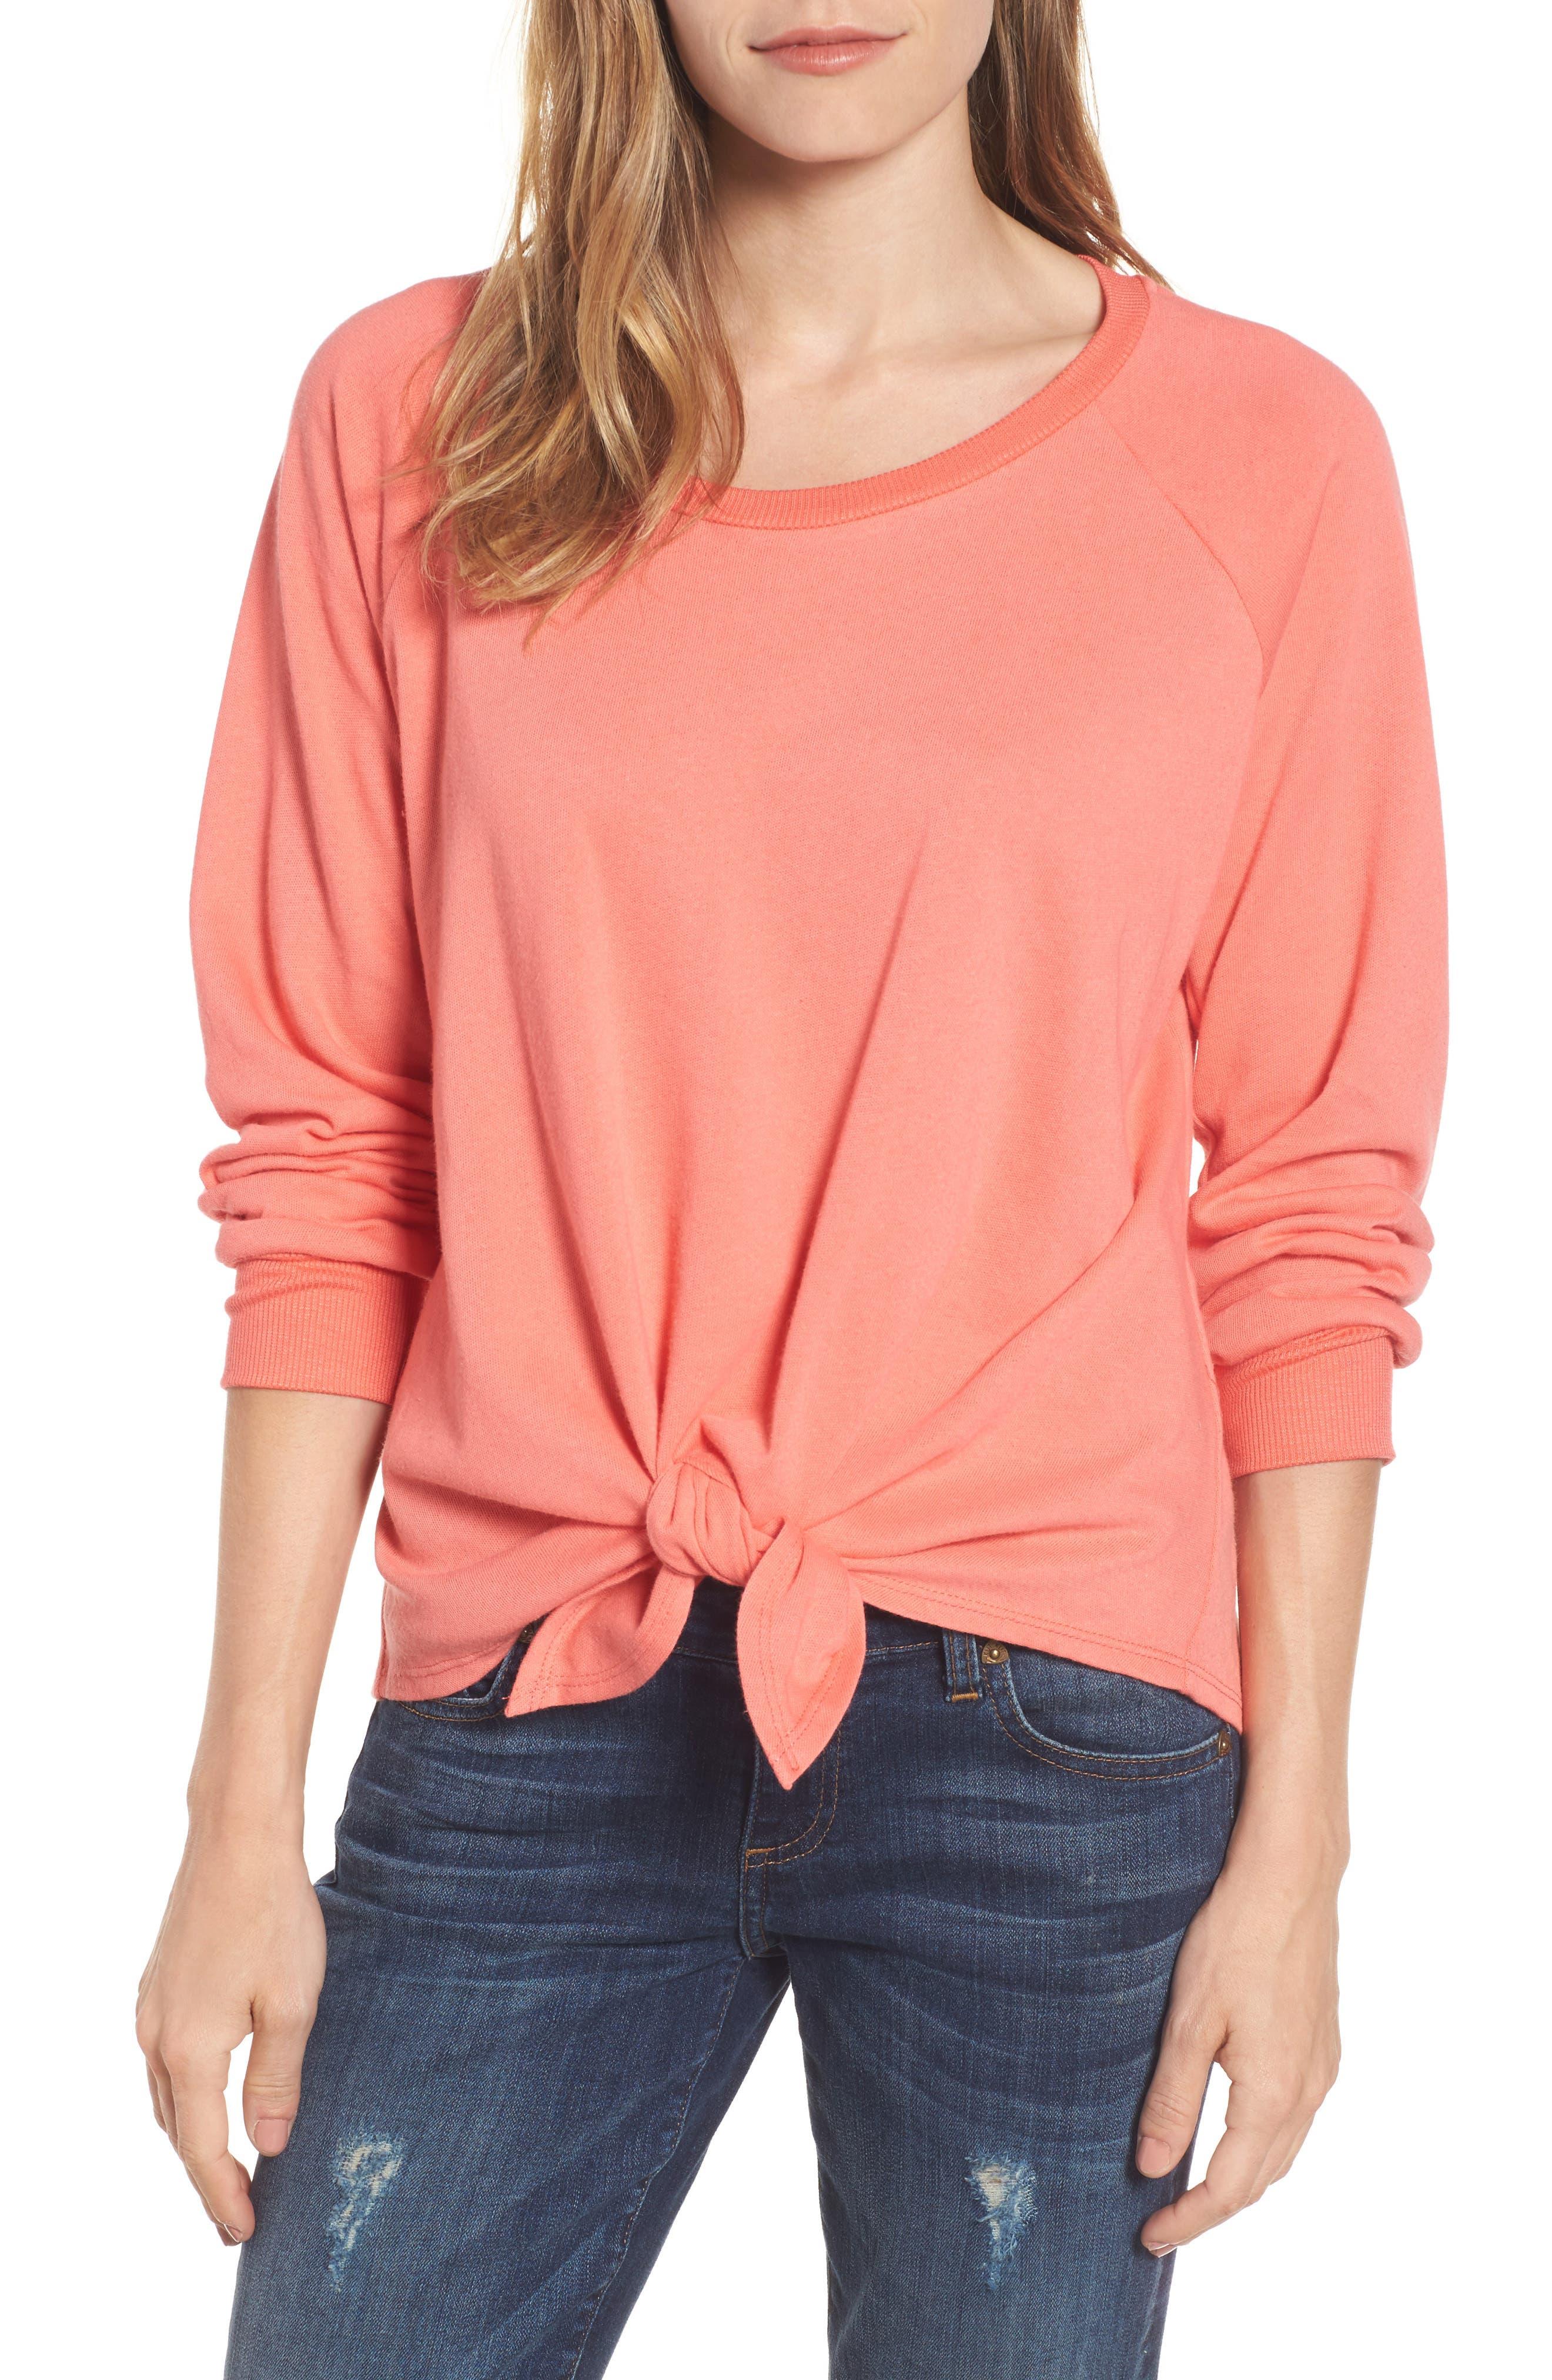 Alternate Image 1 Selected - Caslon® Tie Front Cotton Blend Sweatshirt (Regular & Petite)